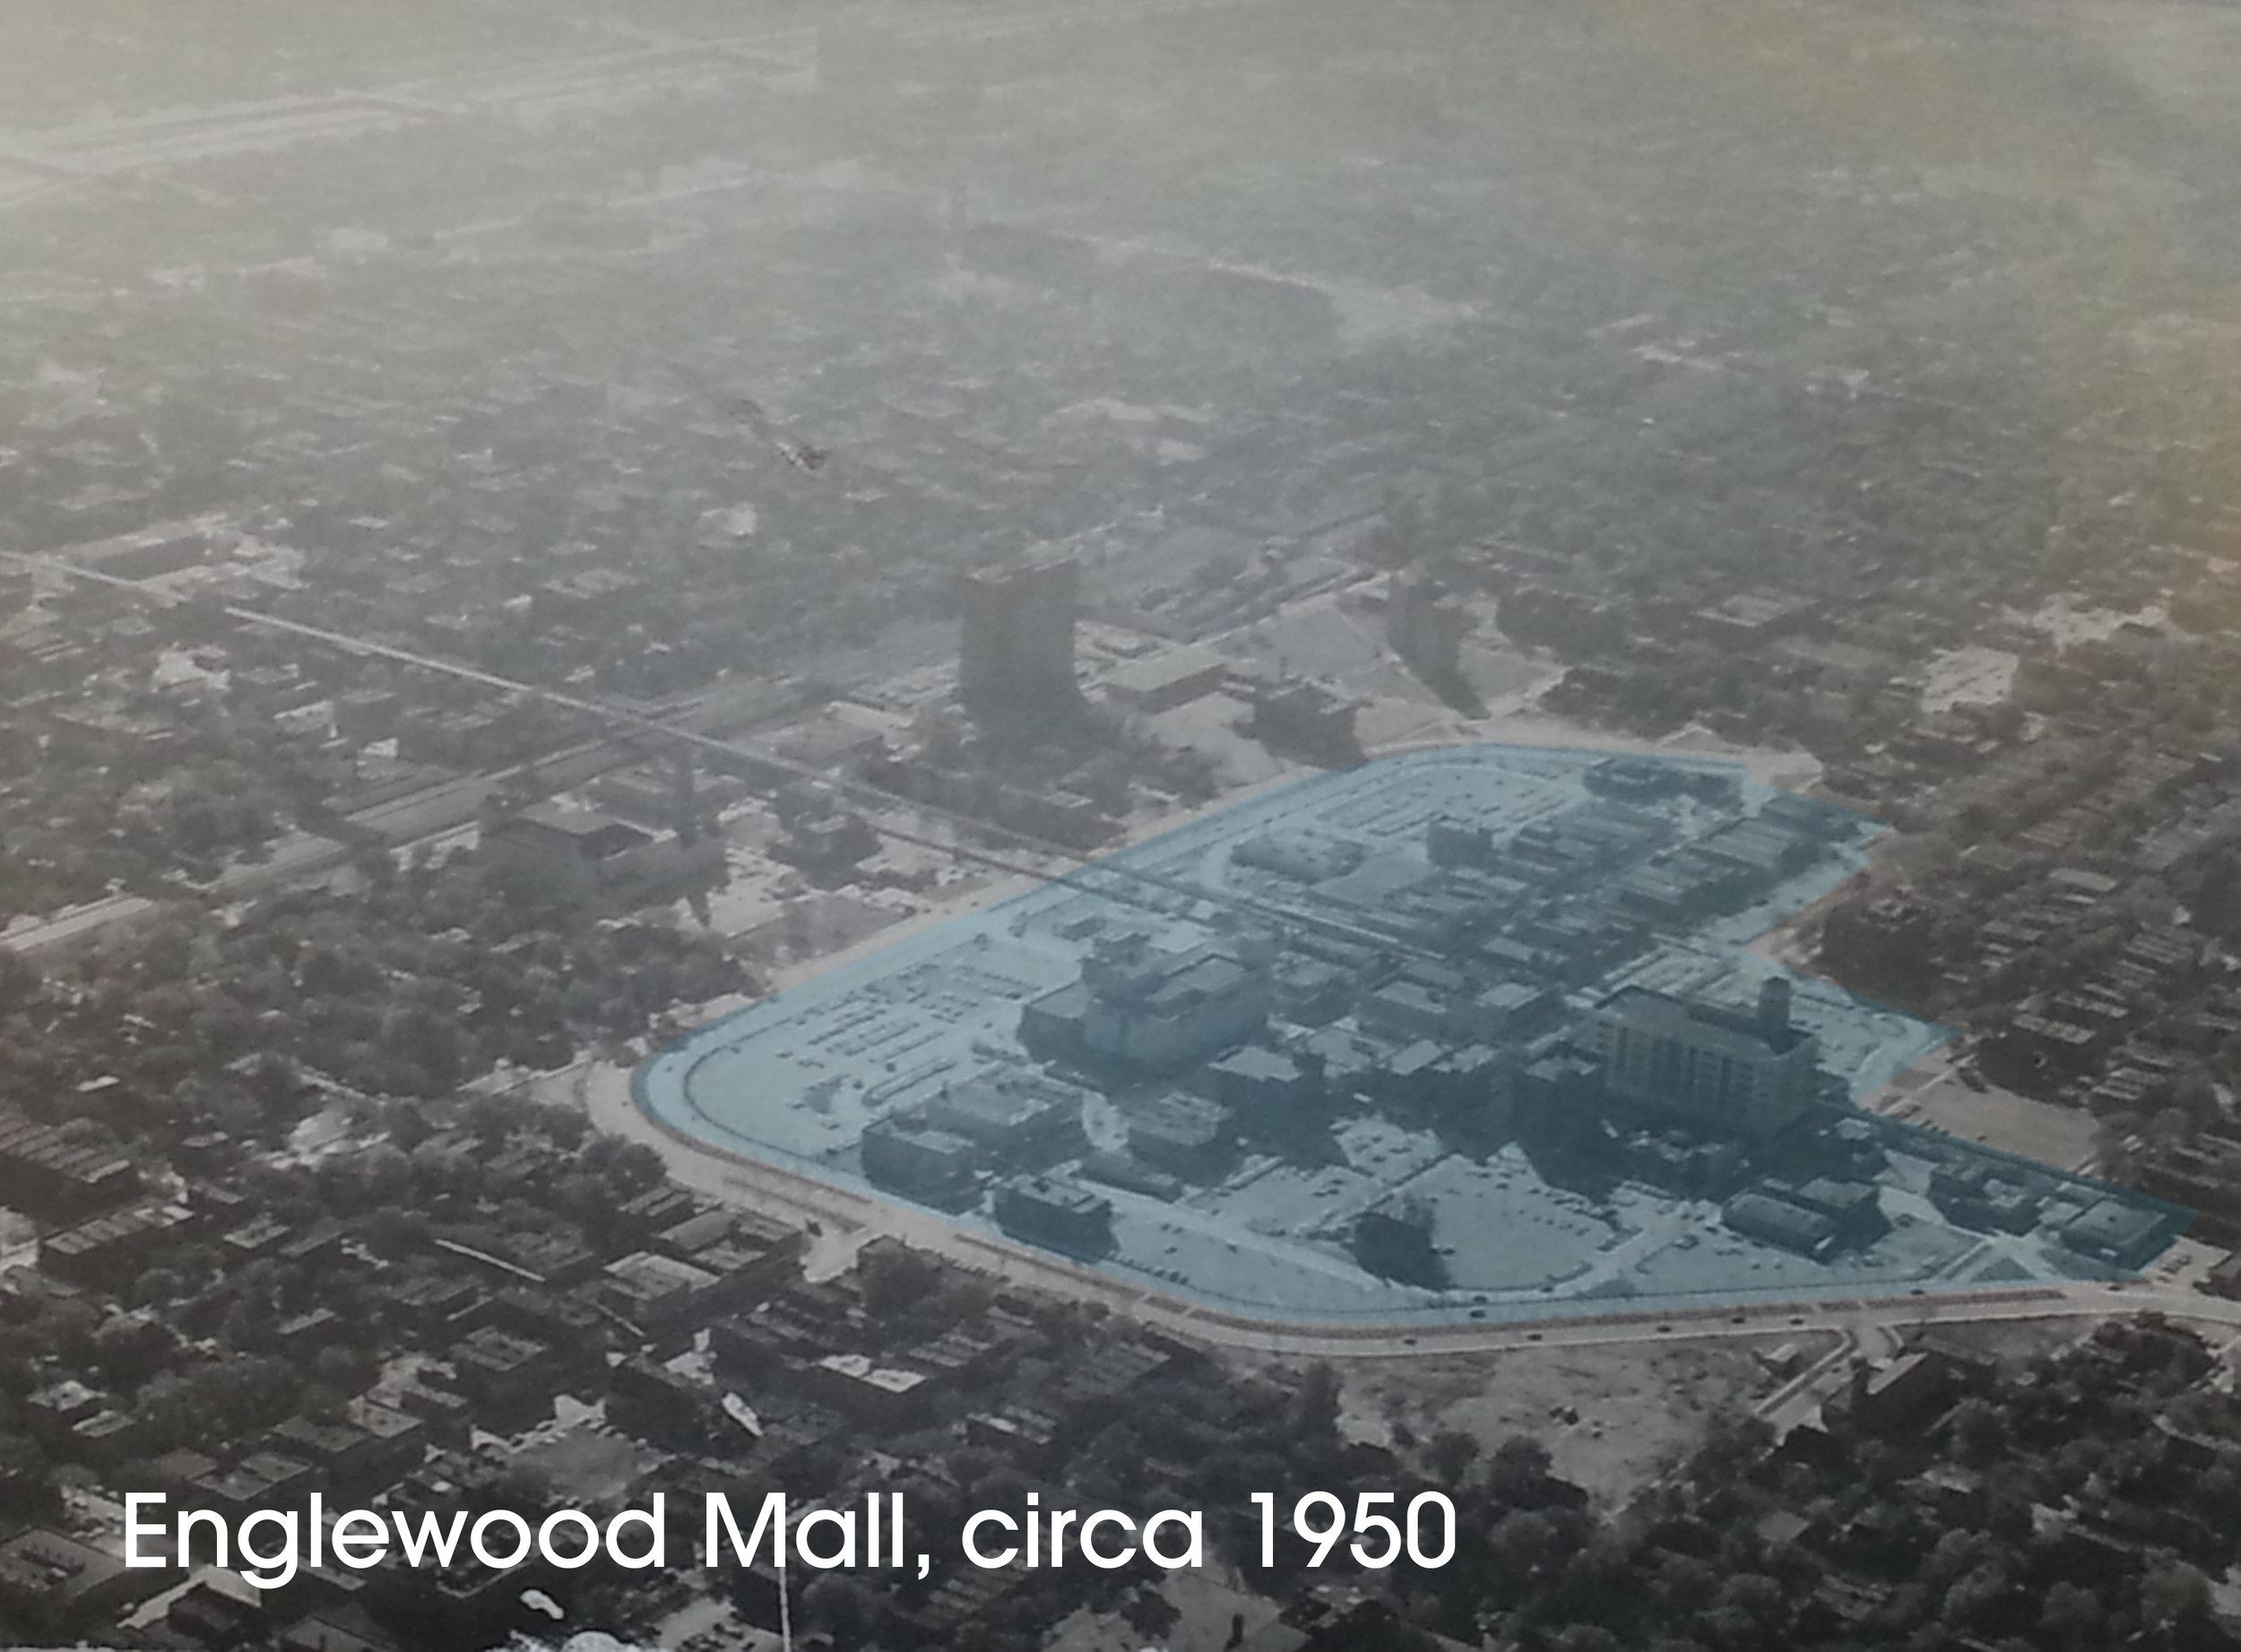 Englewood Mall - Circa 1950 - Highlight.jpg